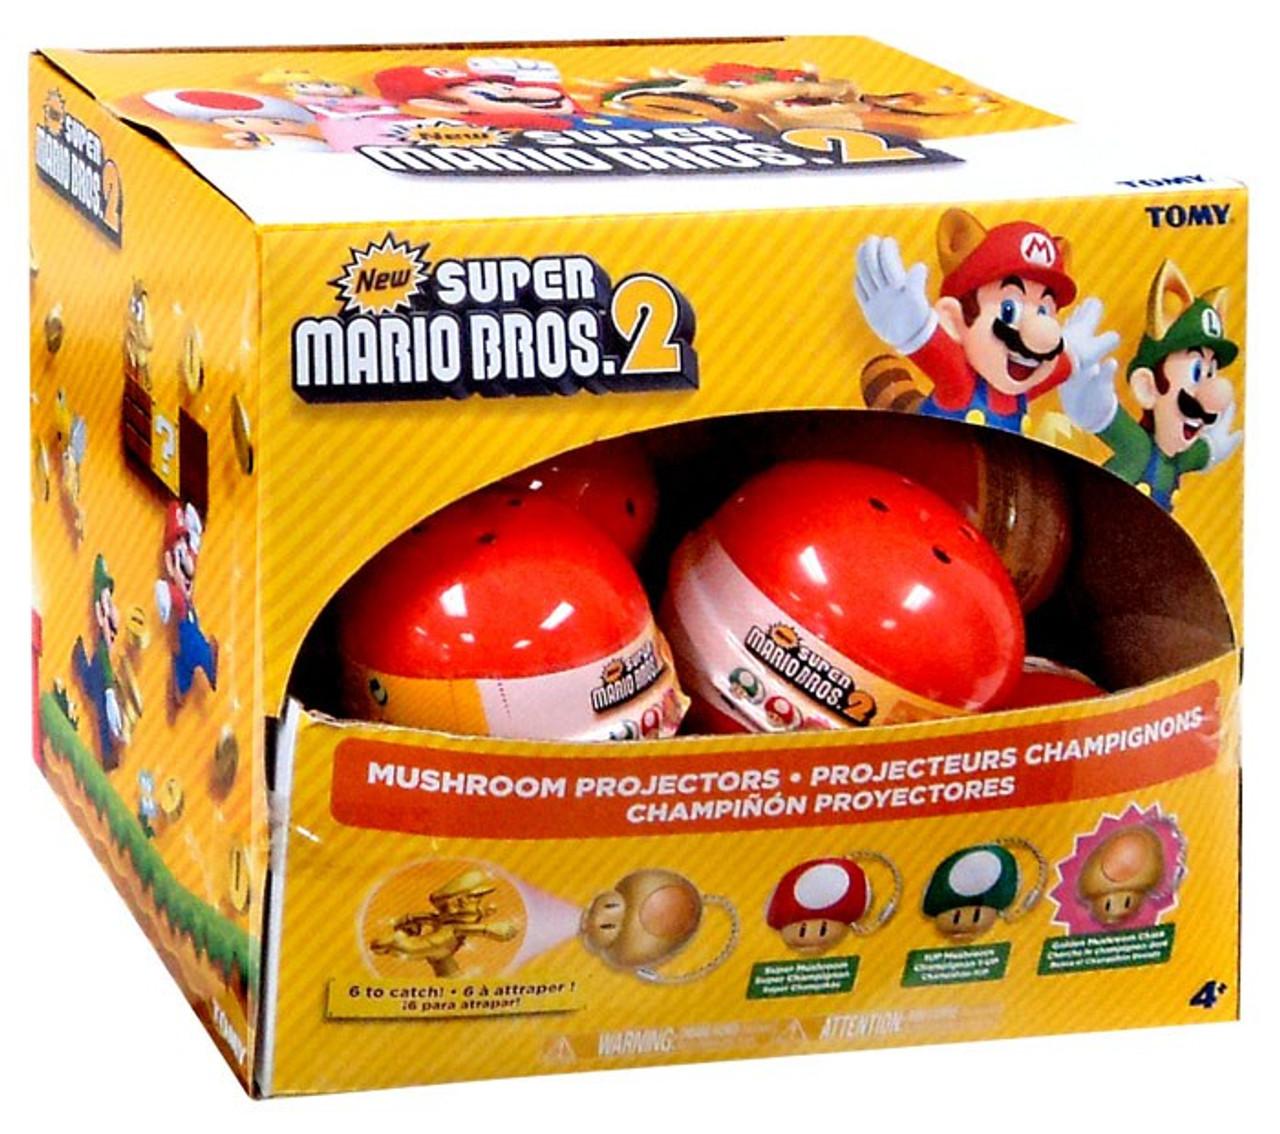 New Super Mario Bros 2 Mushroom Projectors Box 12 Packs Tomy Toywiz